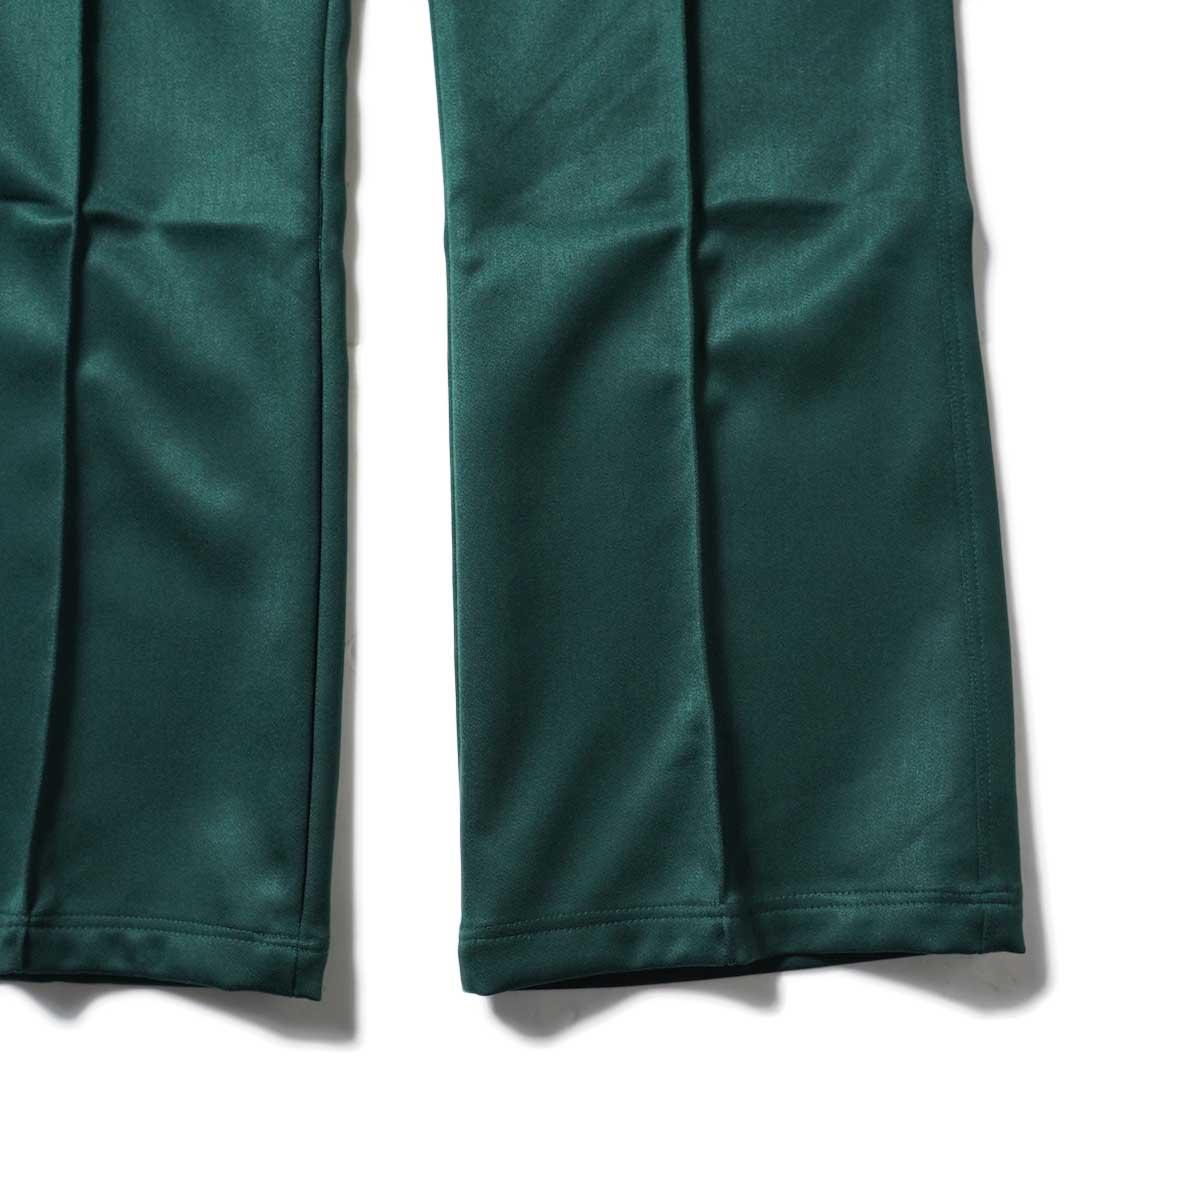 Needles / W.U. BOOT-CUT PANT - PE/R DOESKIN (Green)裾